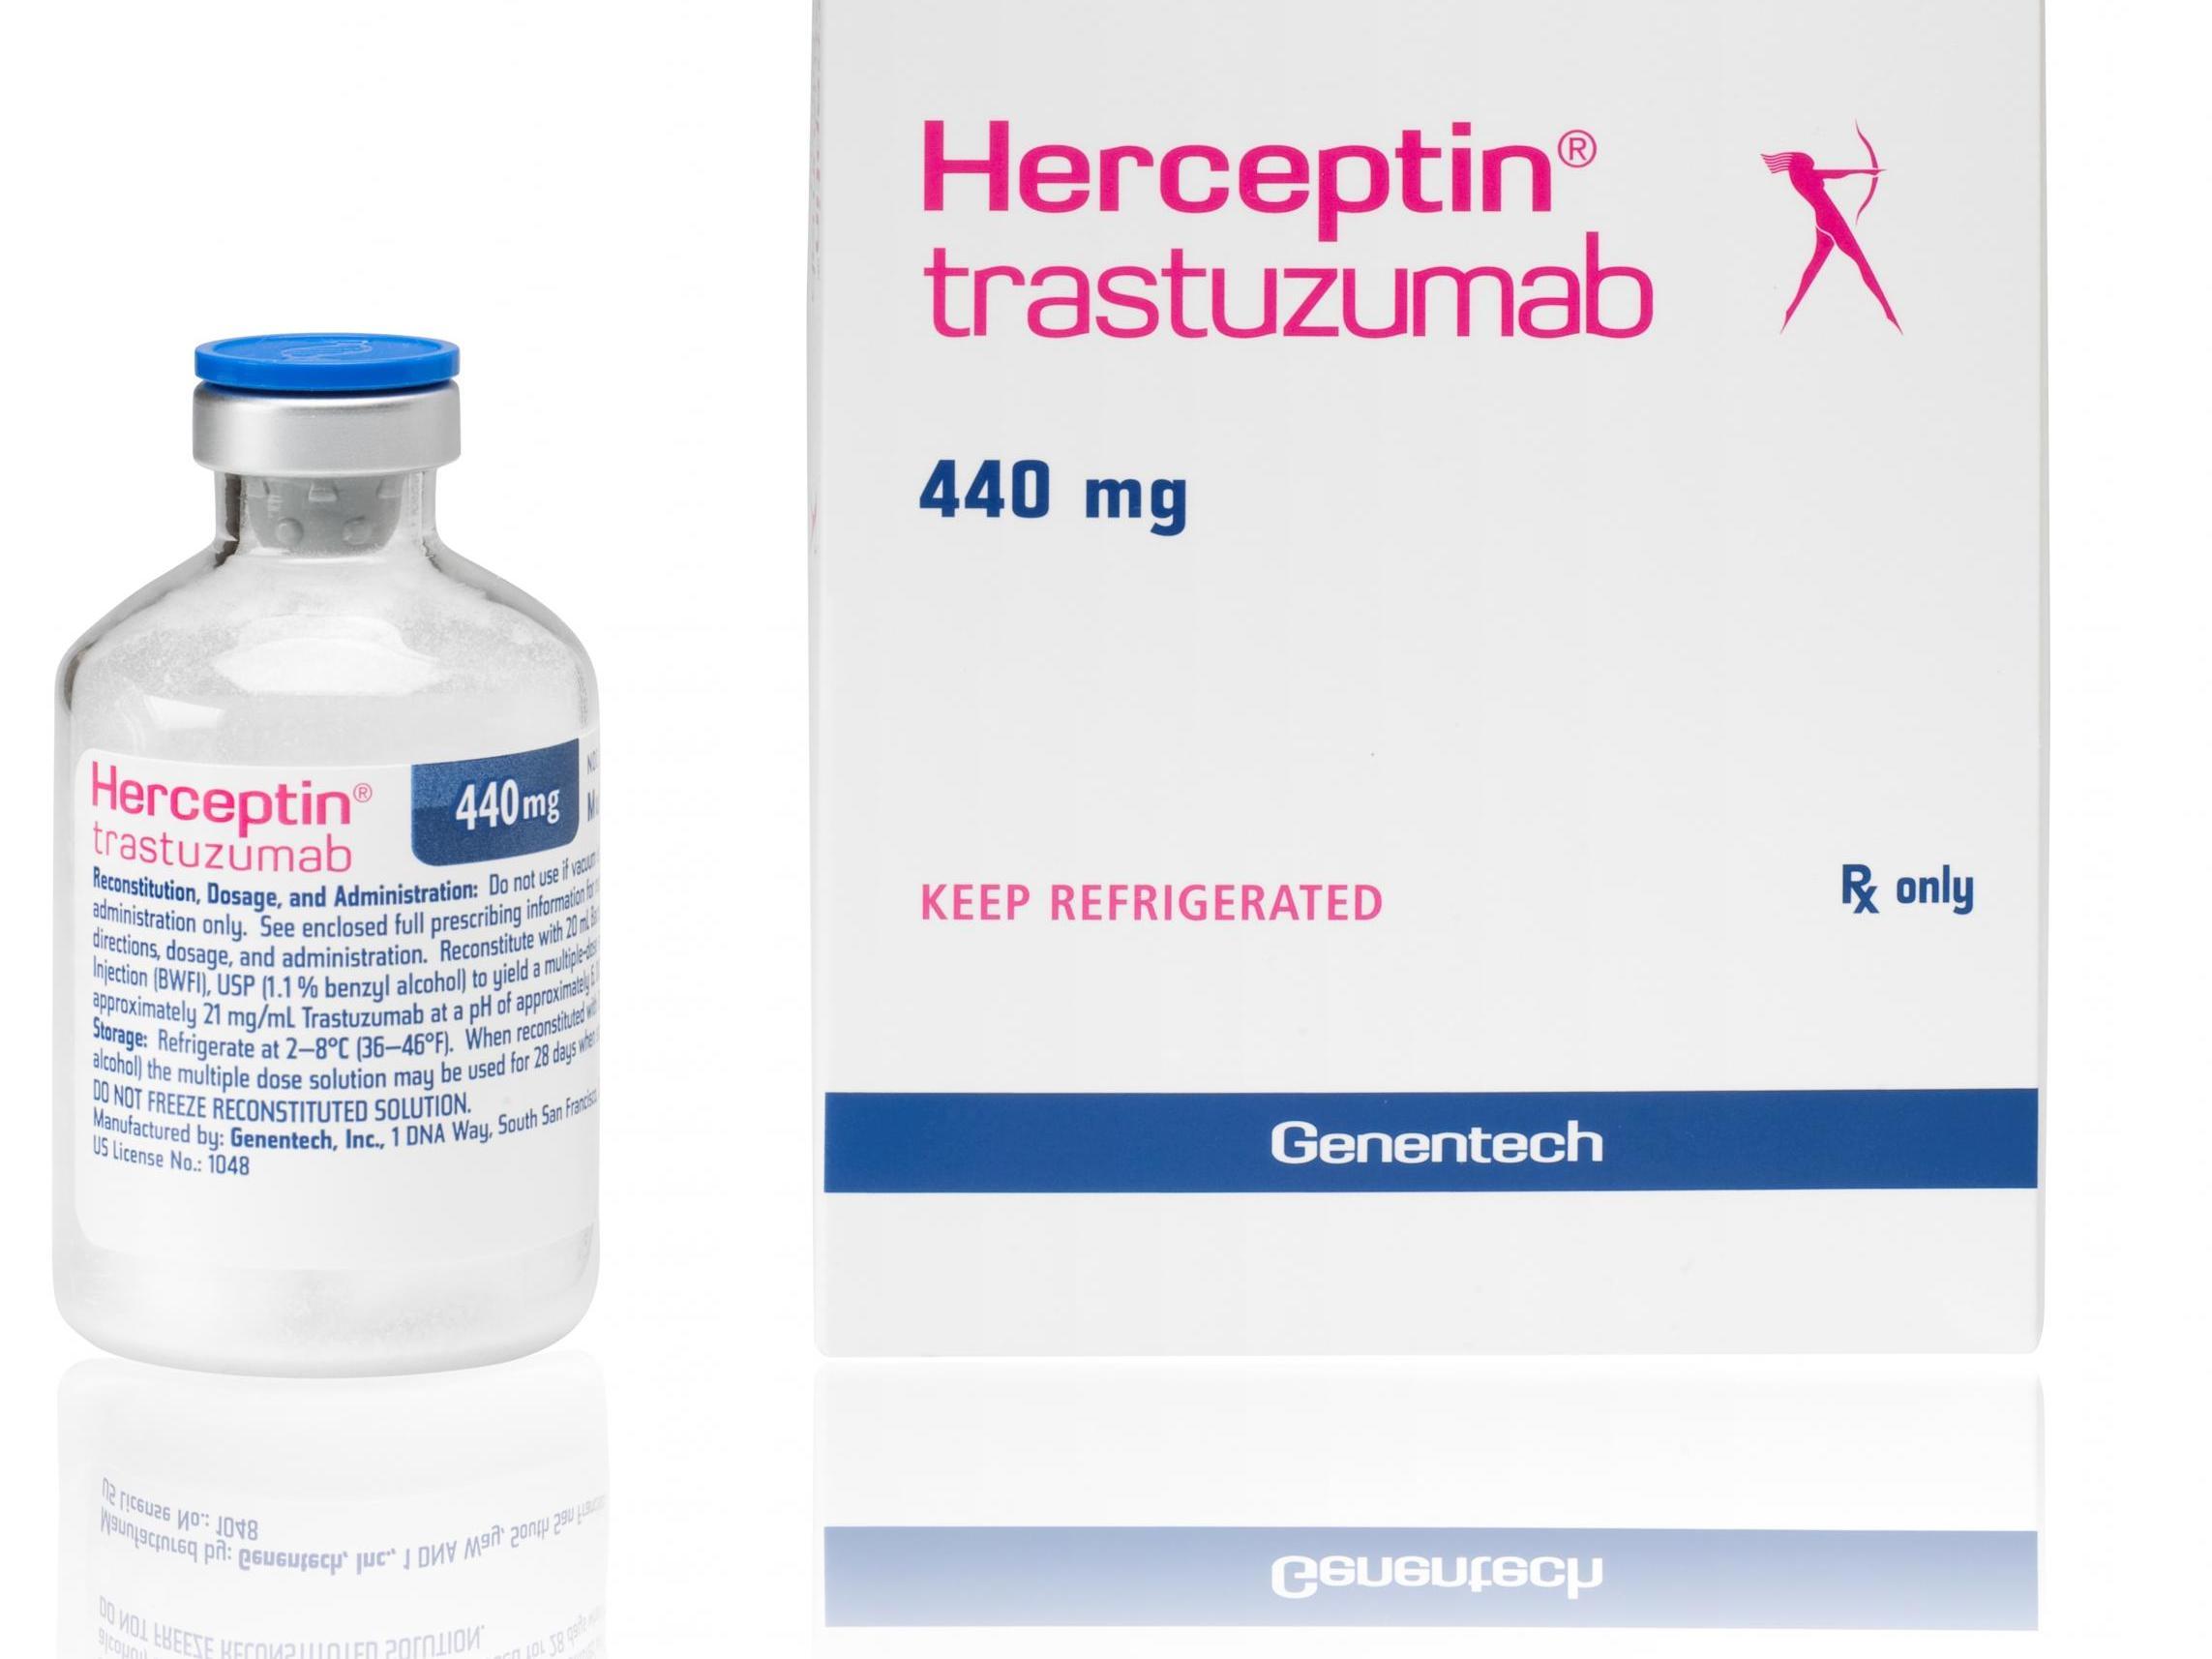 Fiercepharma